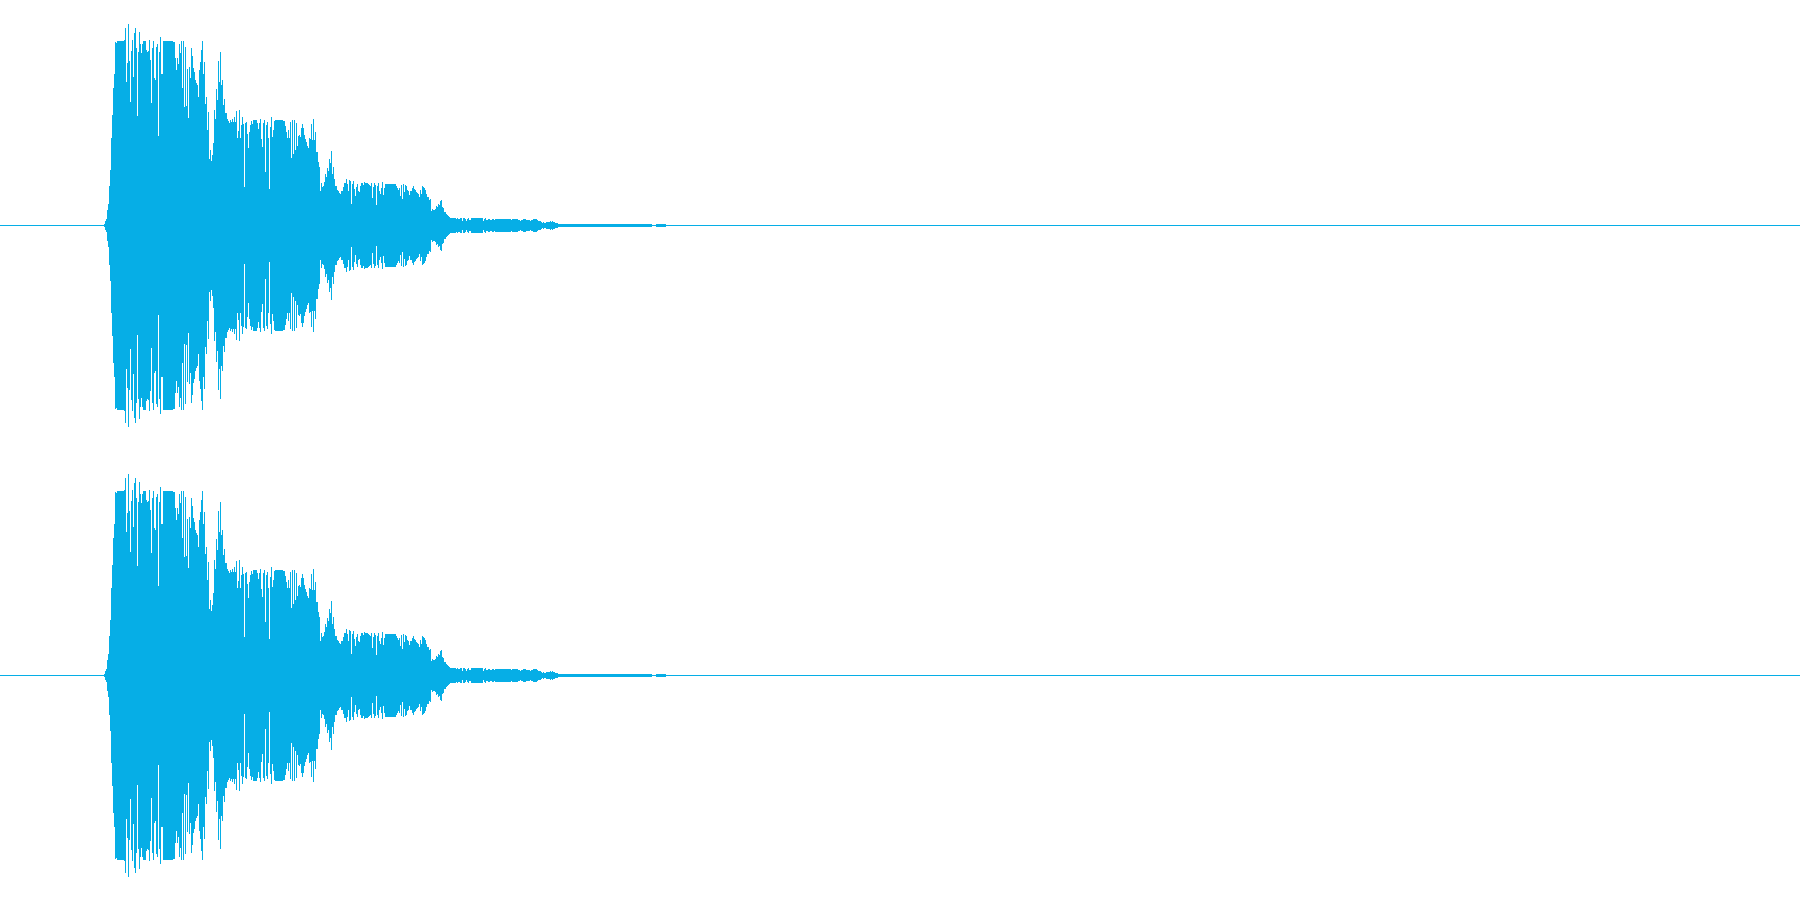 SNES 格闘06-14(選択)の再生済みの波形